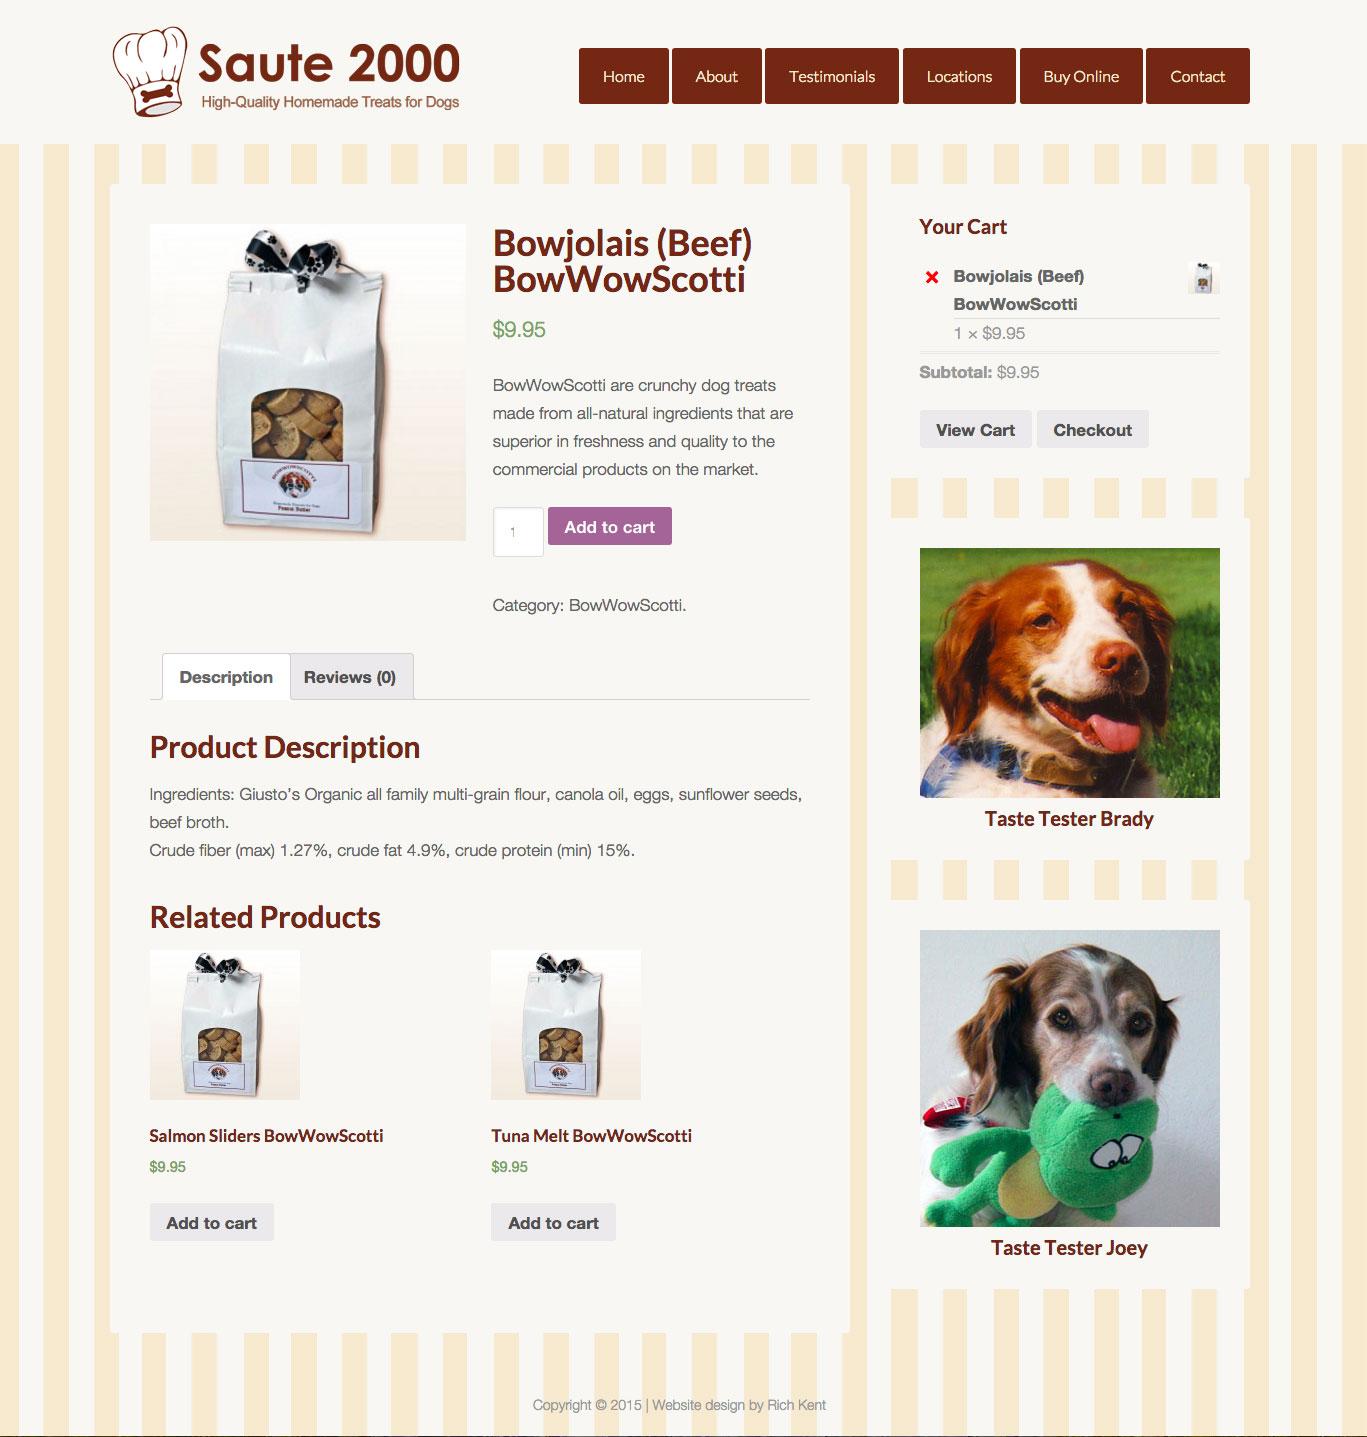 Saute2000.com Store Page